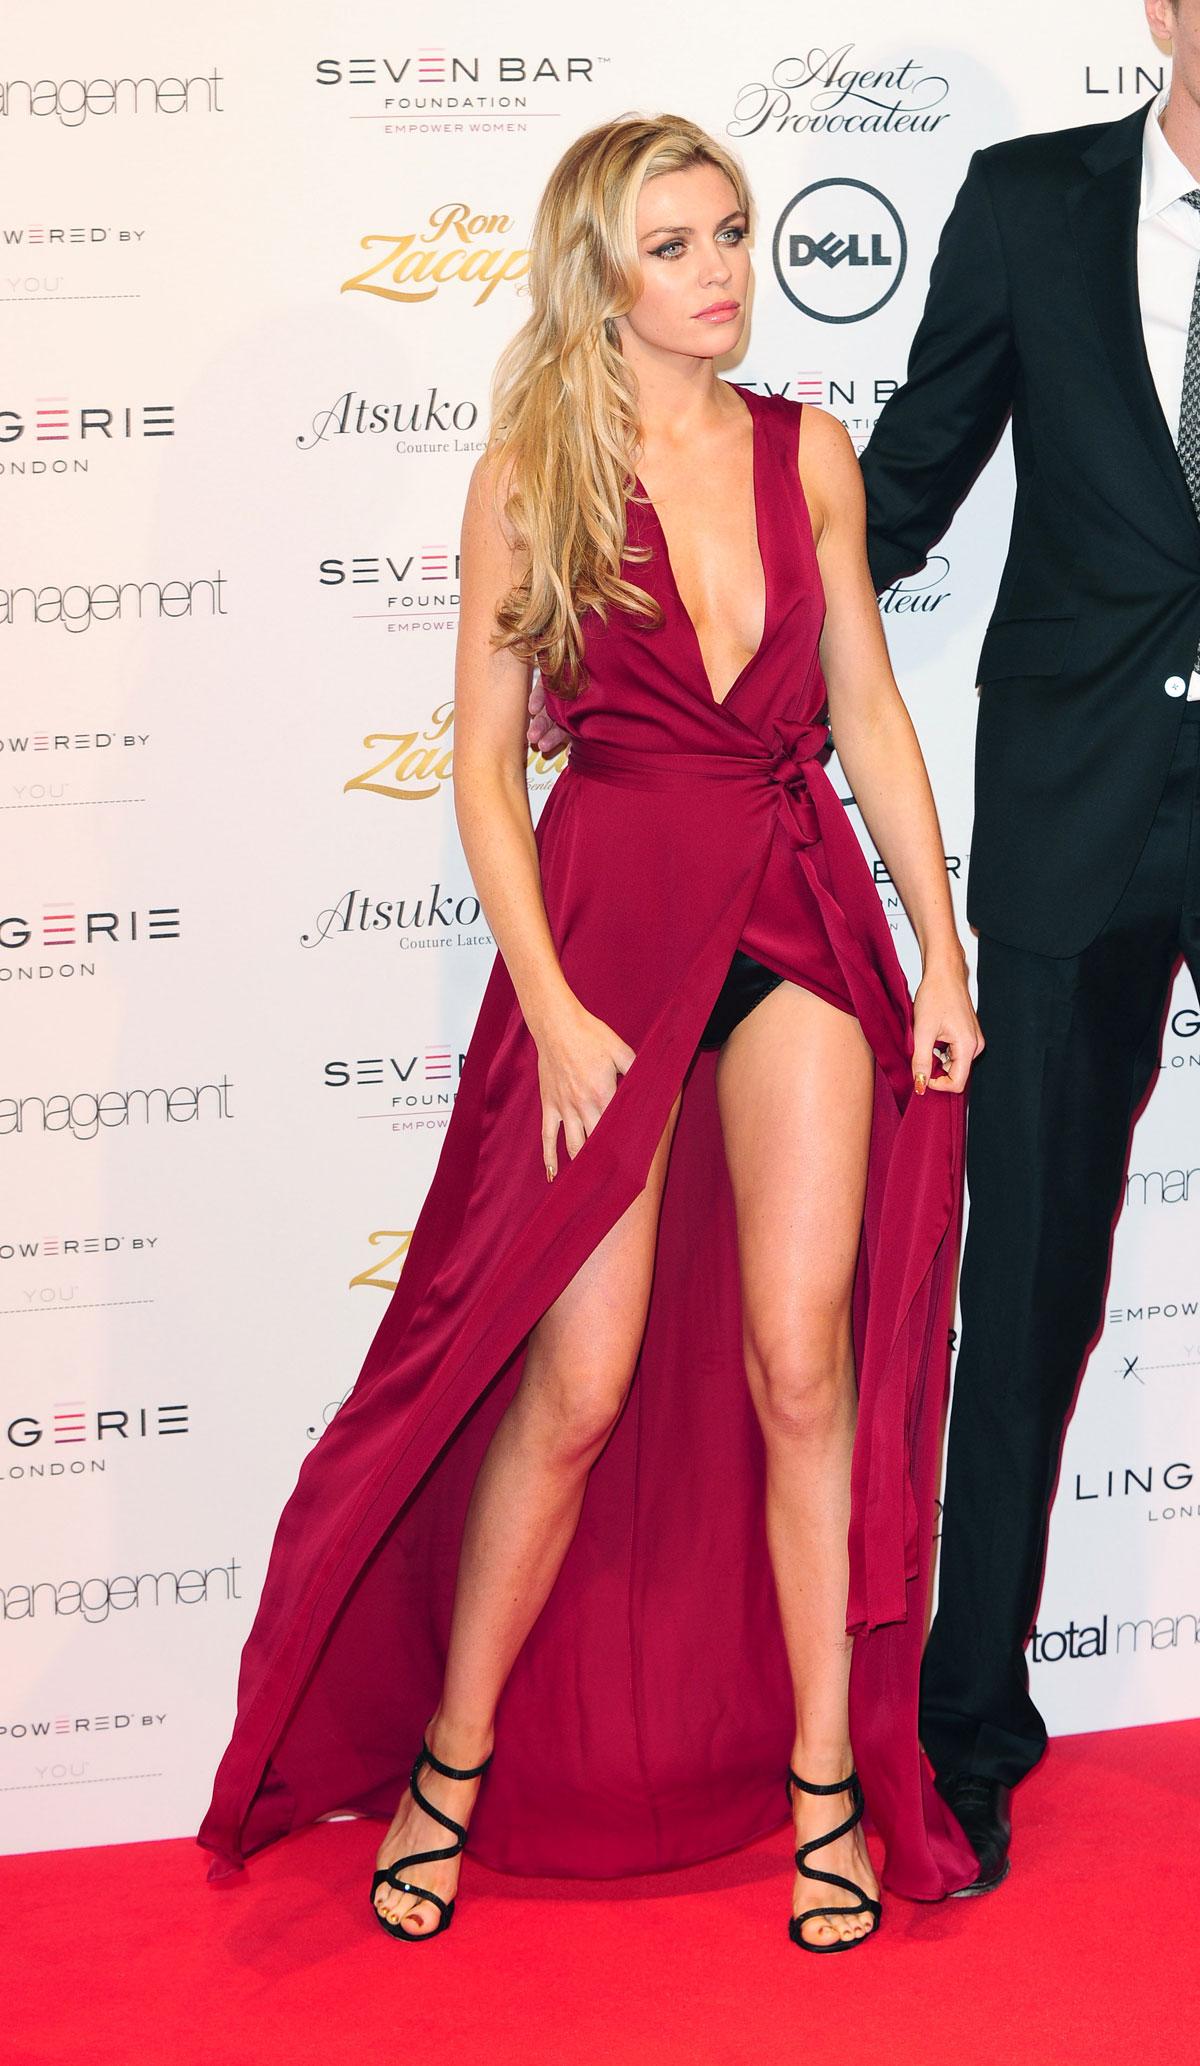 ABBEY CLANCY at London Lingerie Fashion Show – HawtCelebs